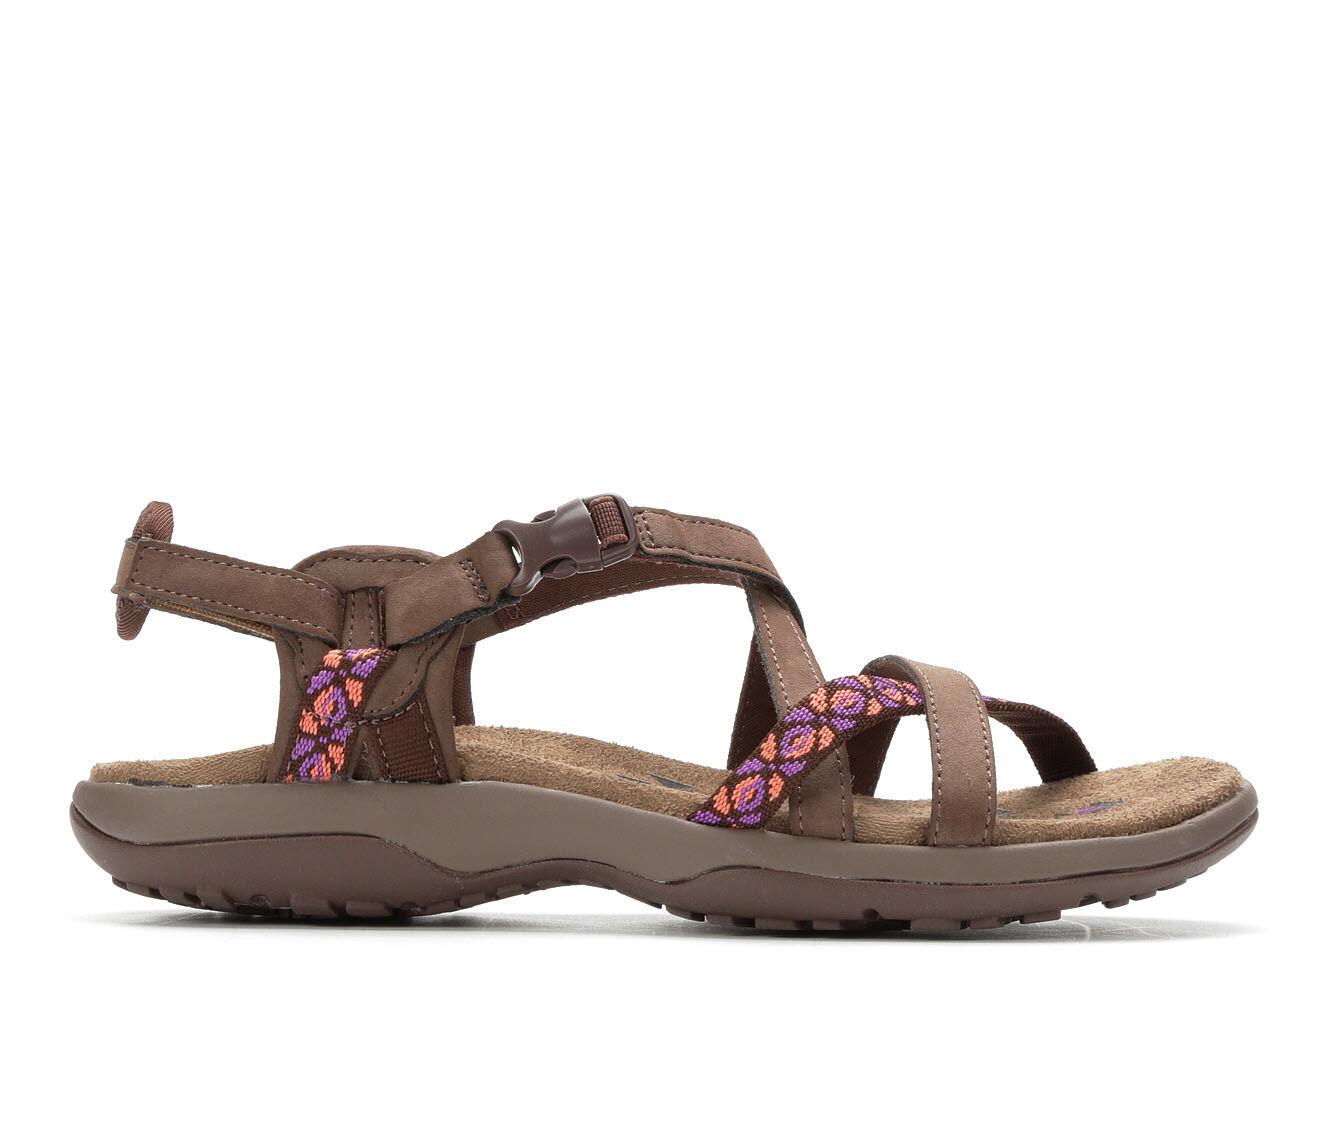 Skechers Reggae Slim-Vacay ... Women's Sandals vlYJ0gurkl